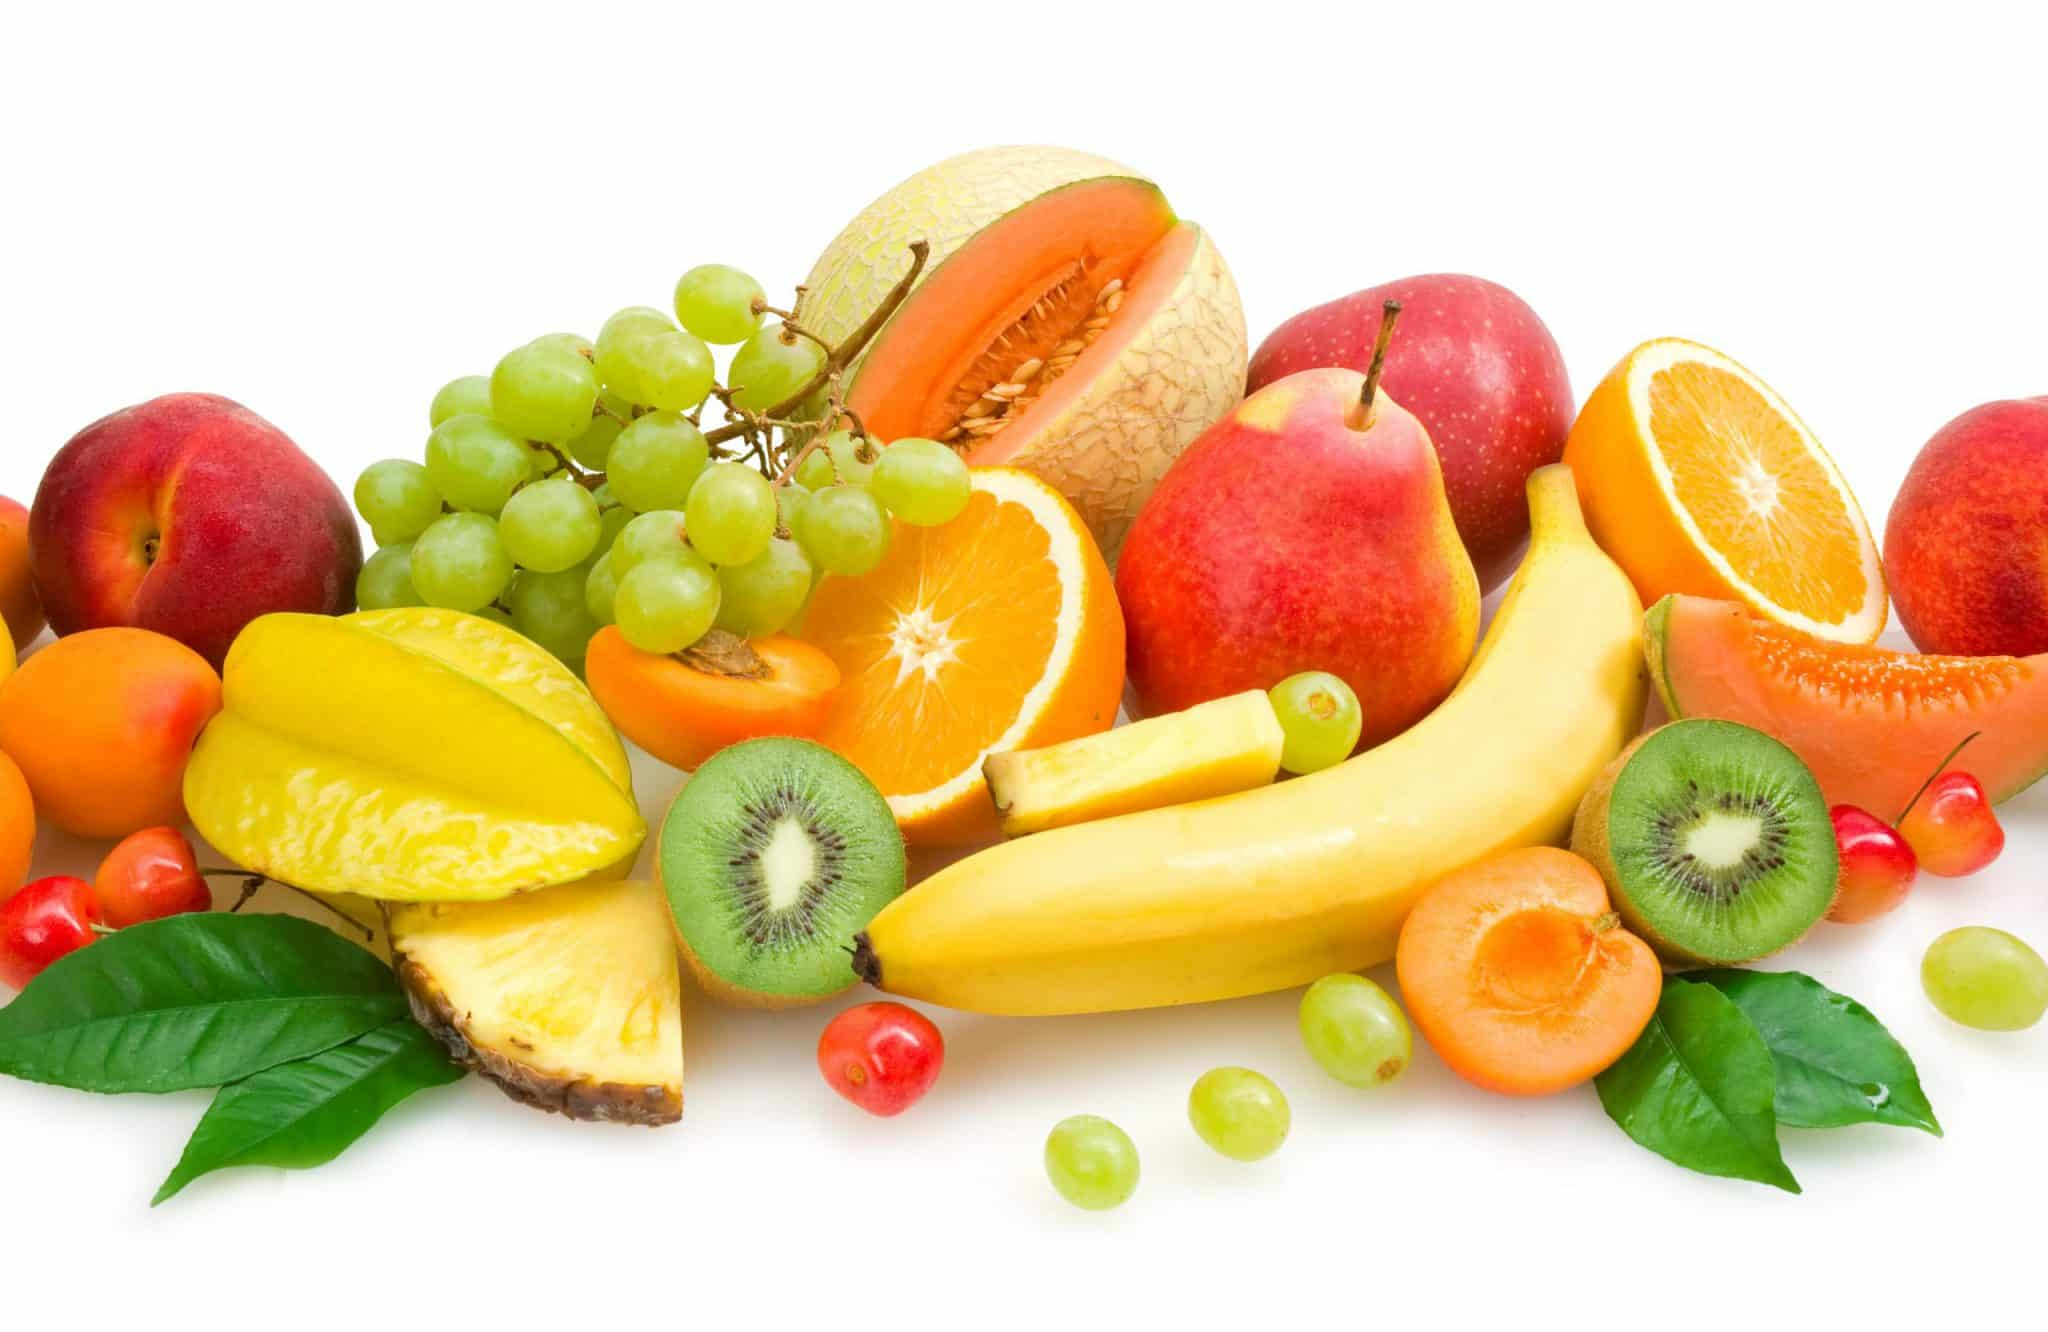 10 alimenti antifatica per avere più energia